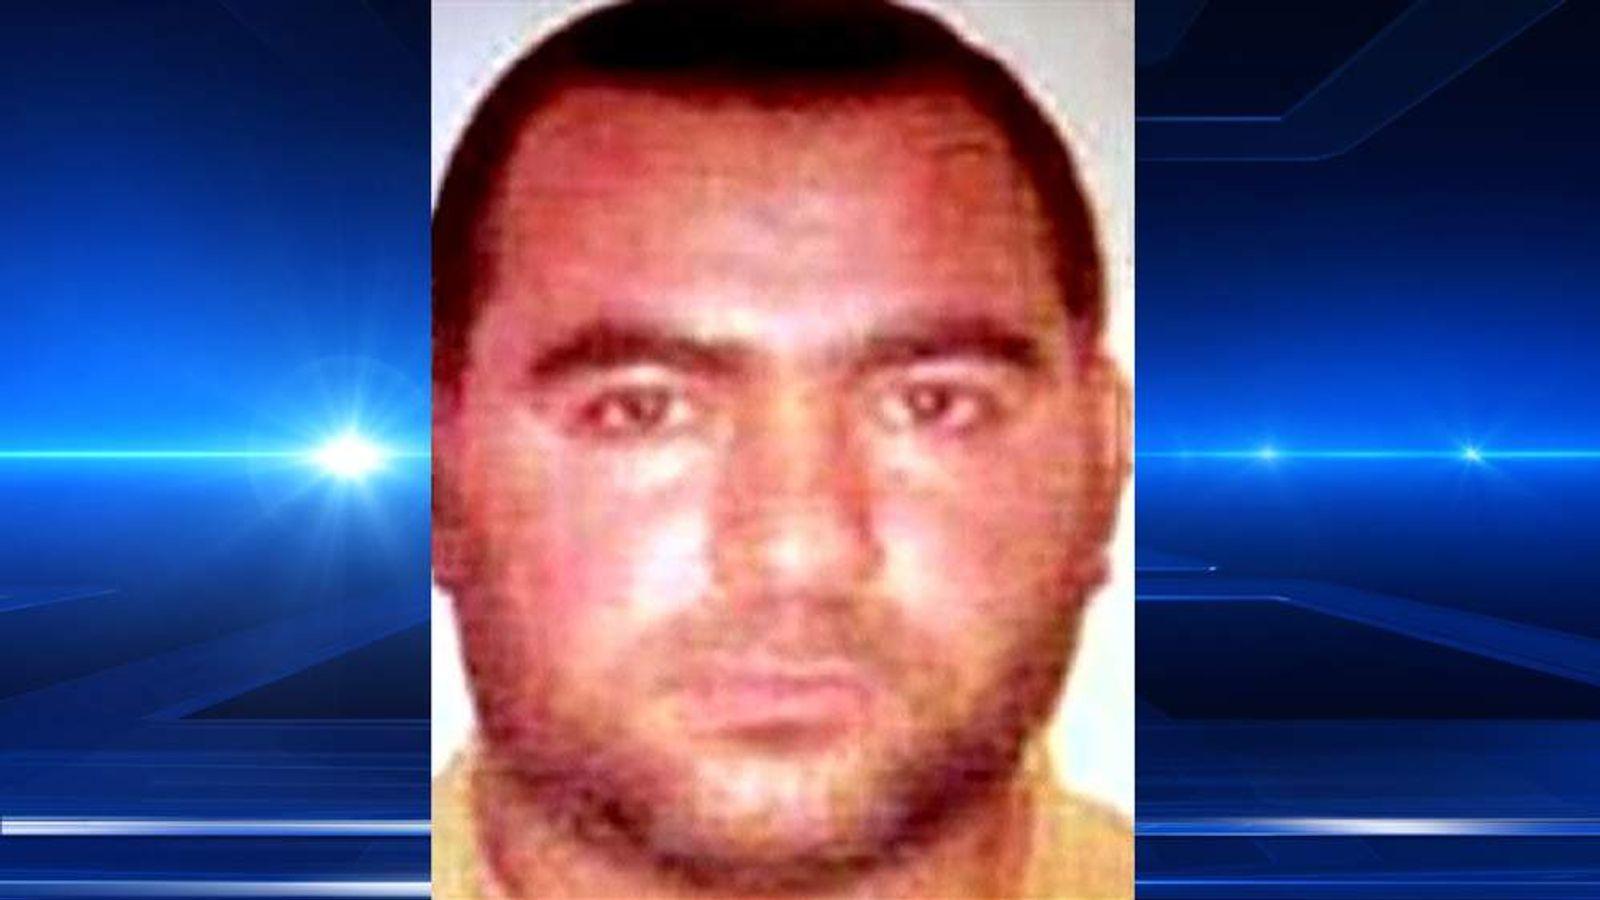 Abu Bakr Al Baghdadi